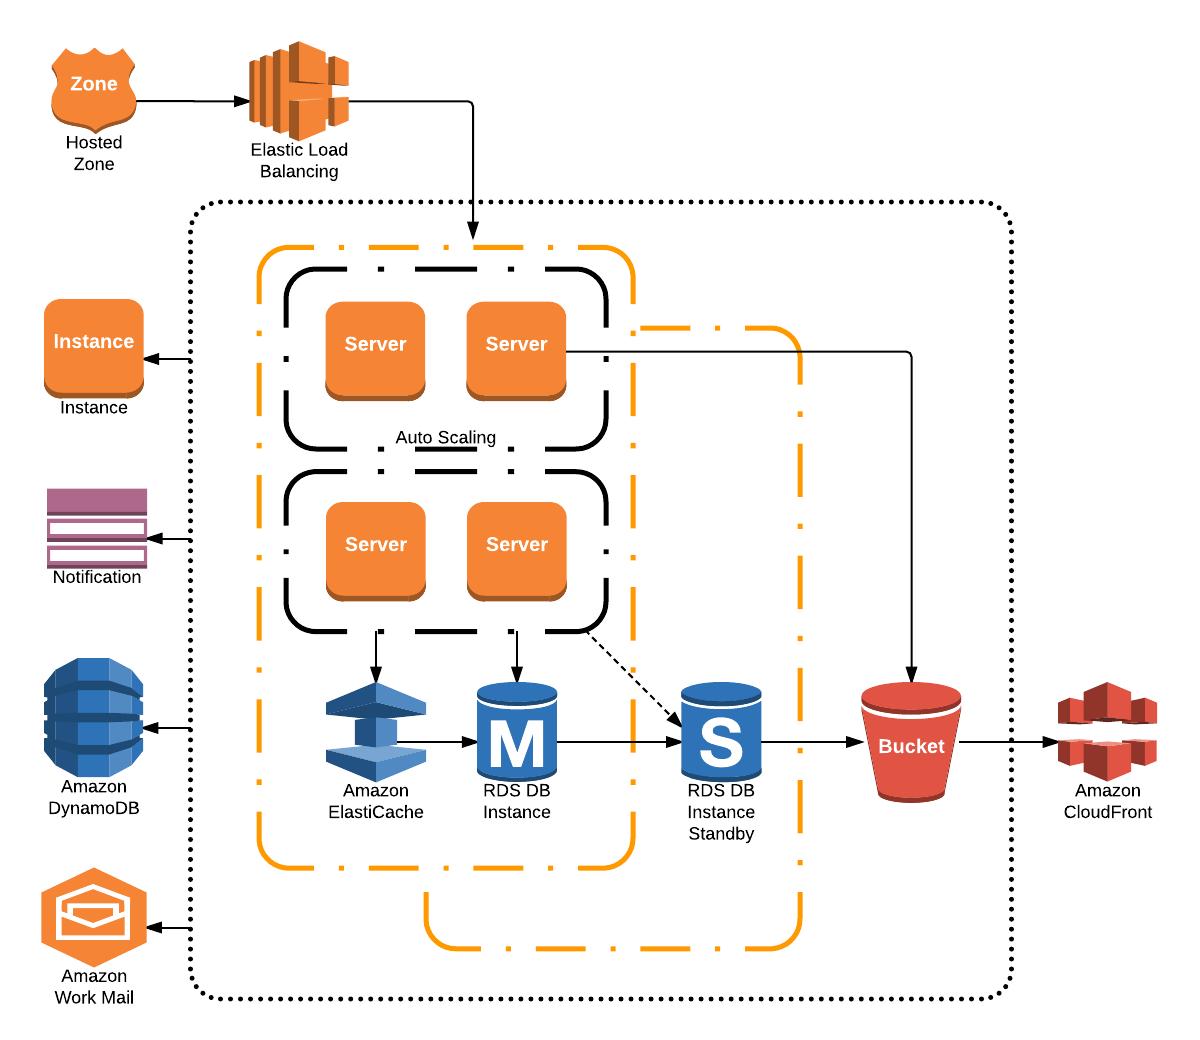 aws infrastructure diagram